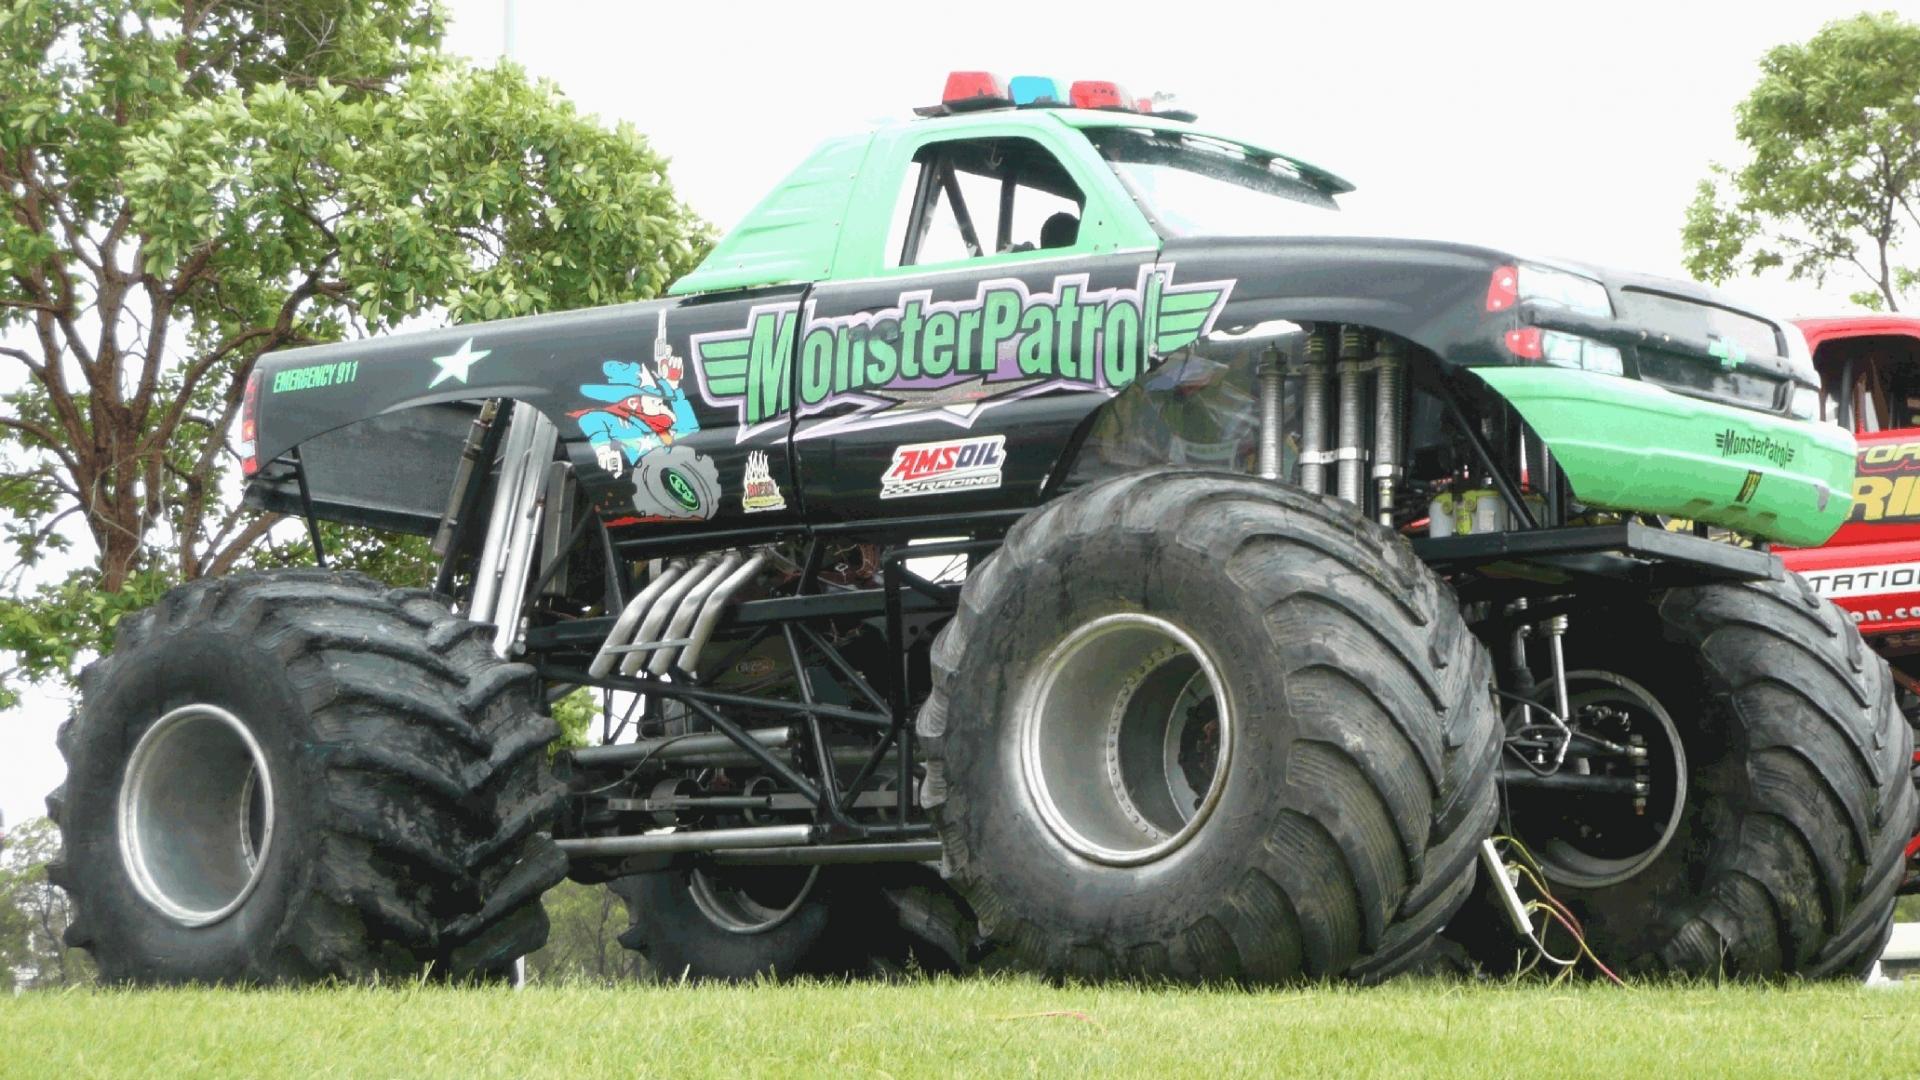 Image Monster Truck Racing Wallpapers Jpg Monster